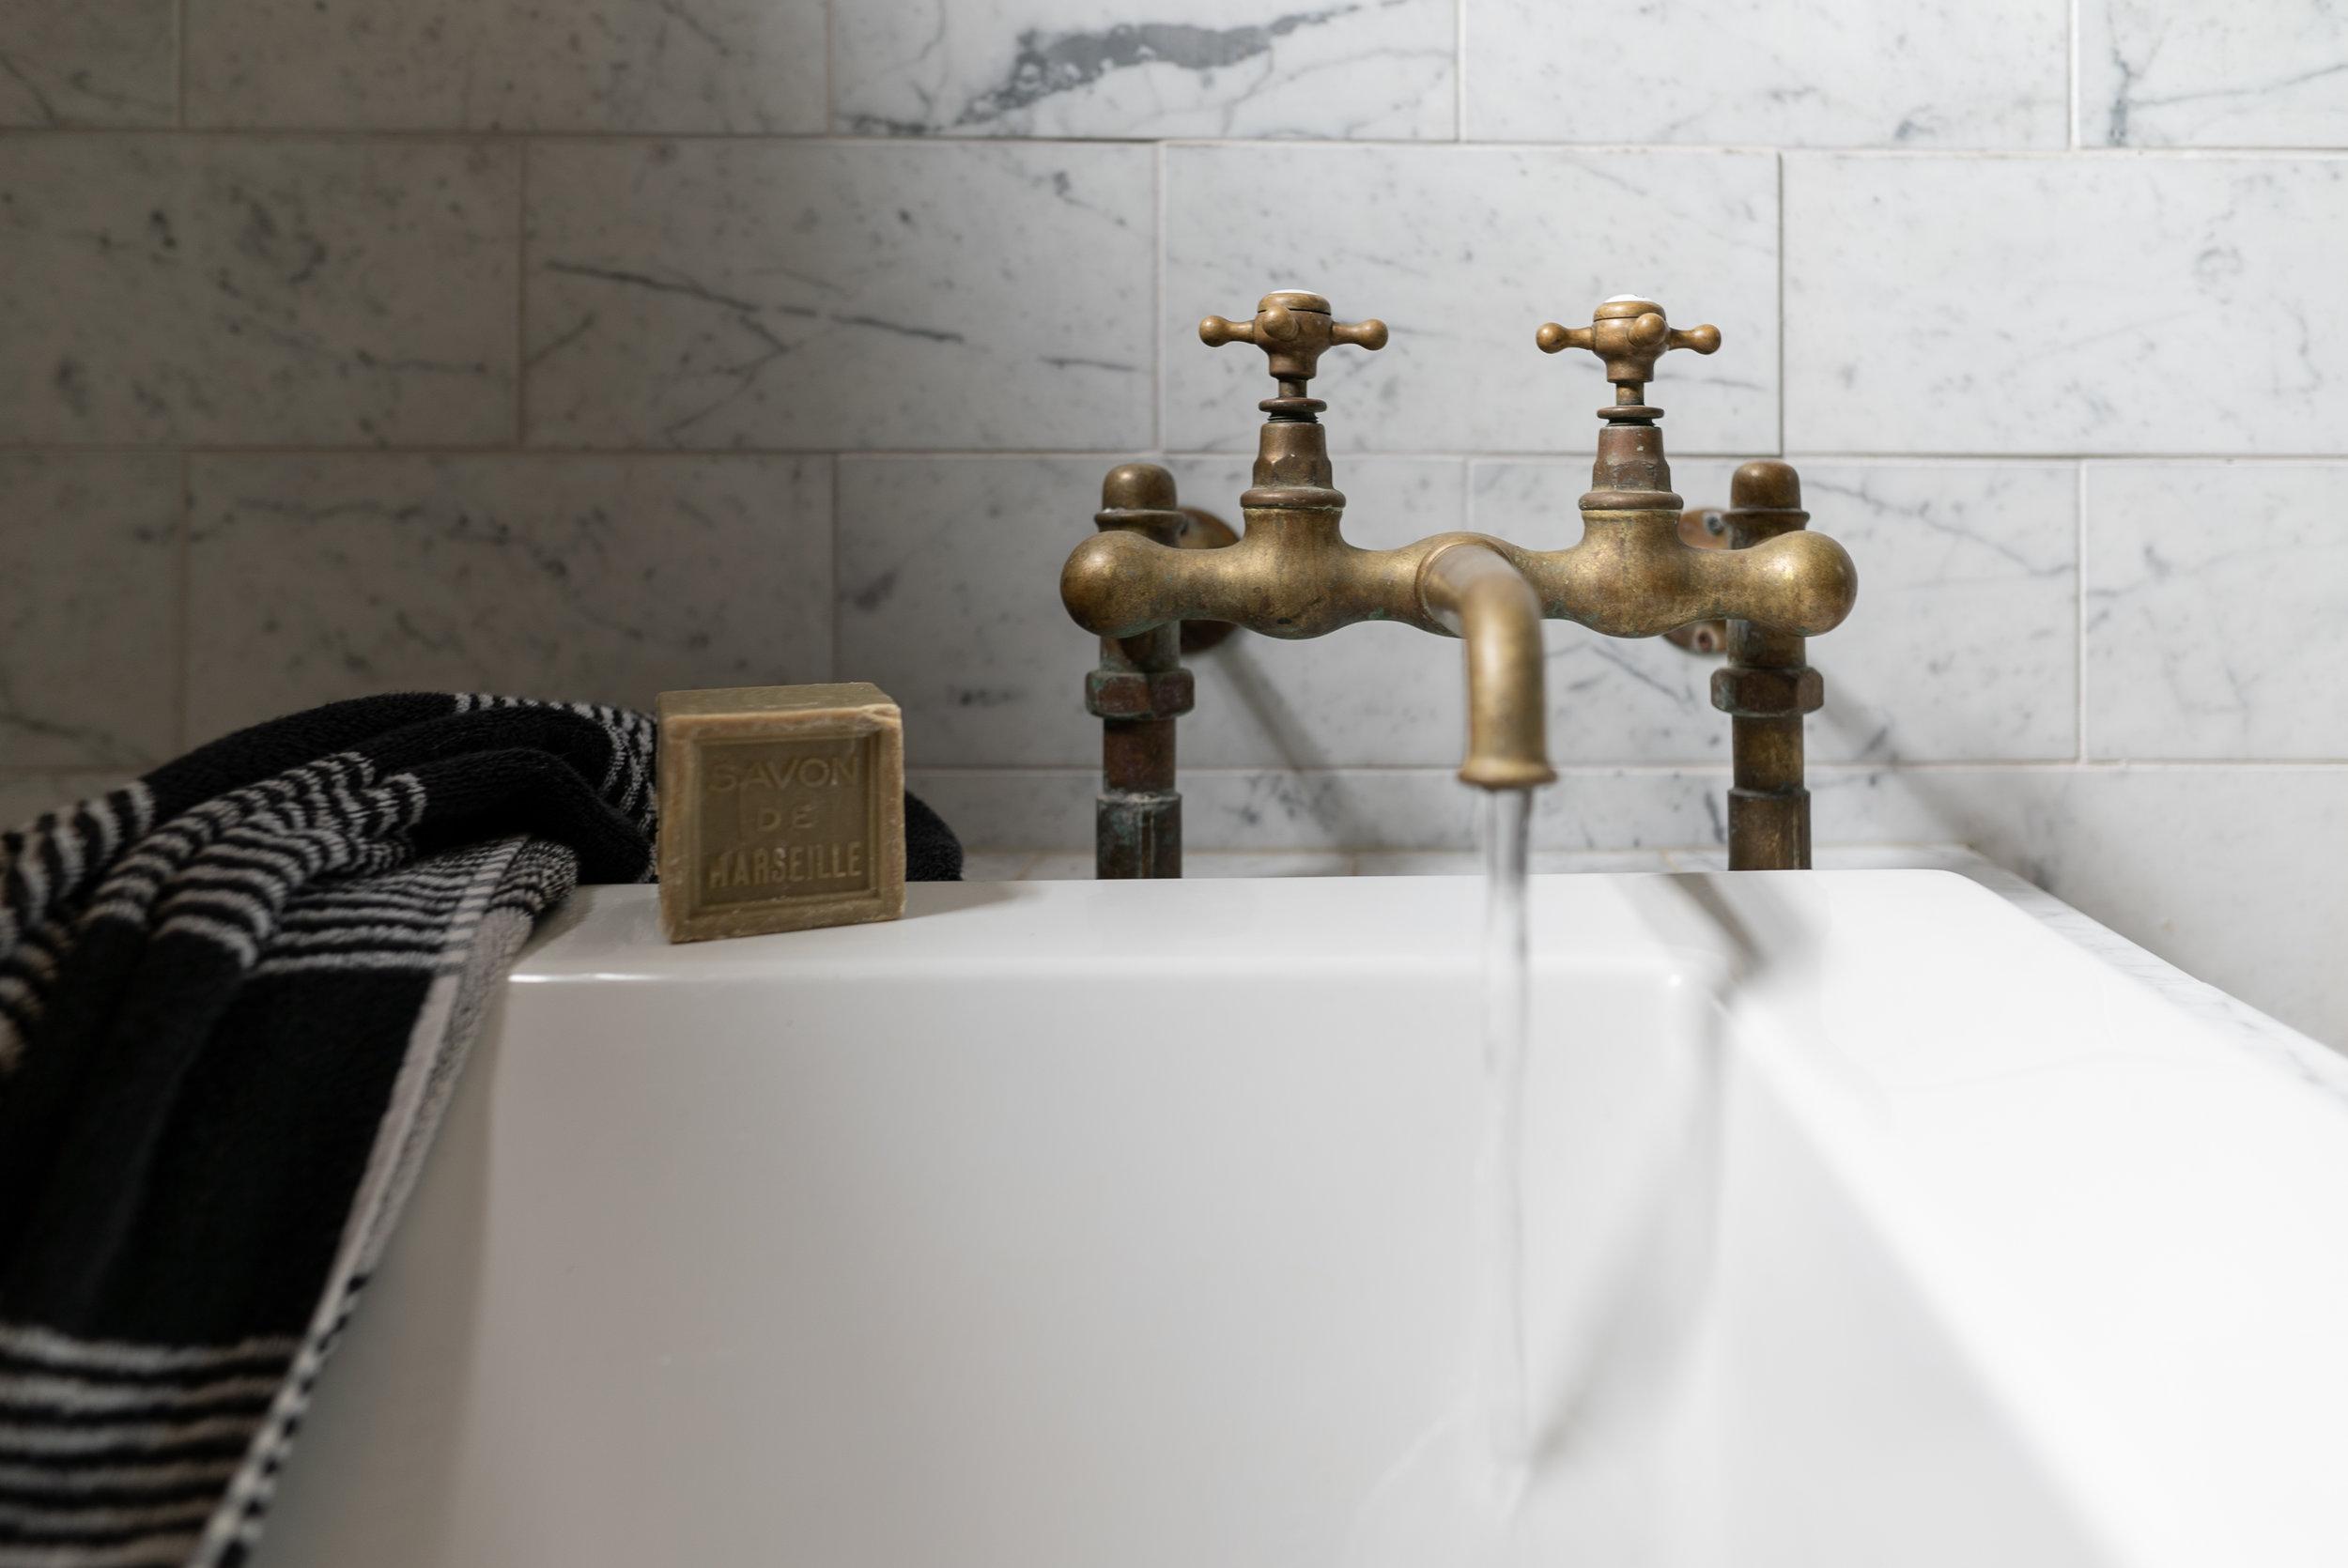 vintage tub filler water on-09982.jpg